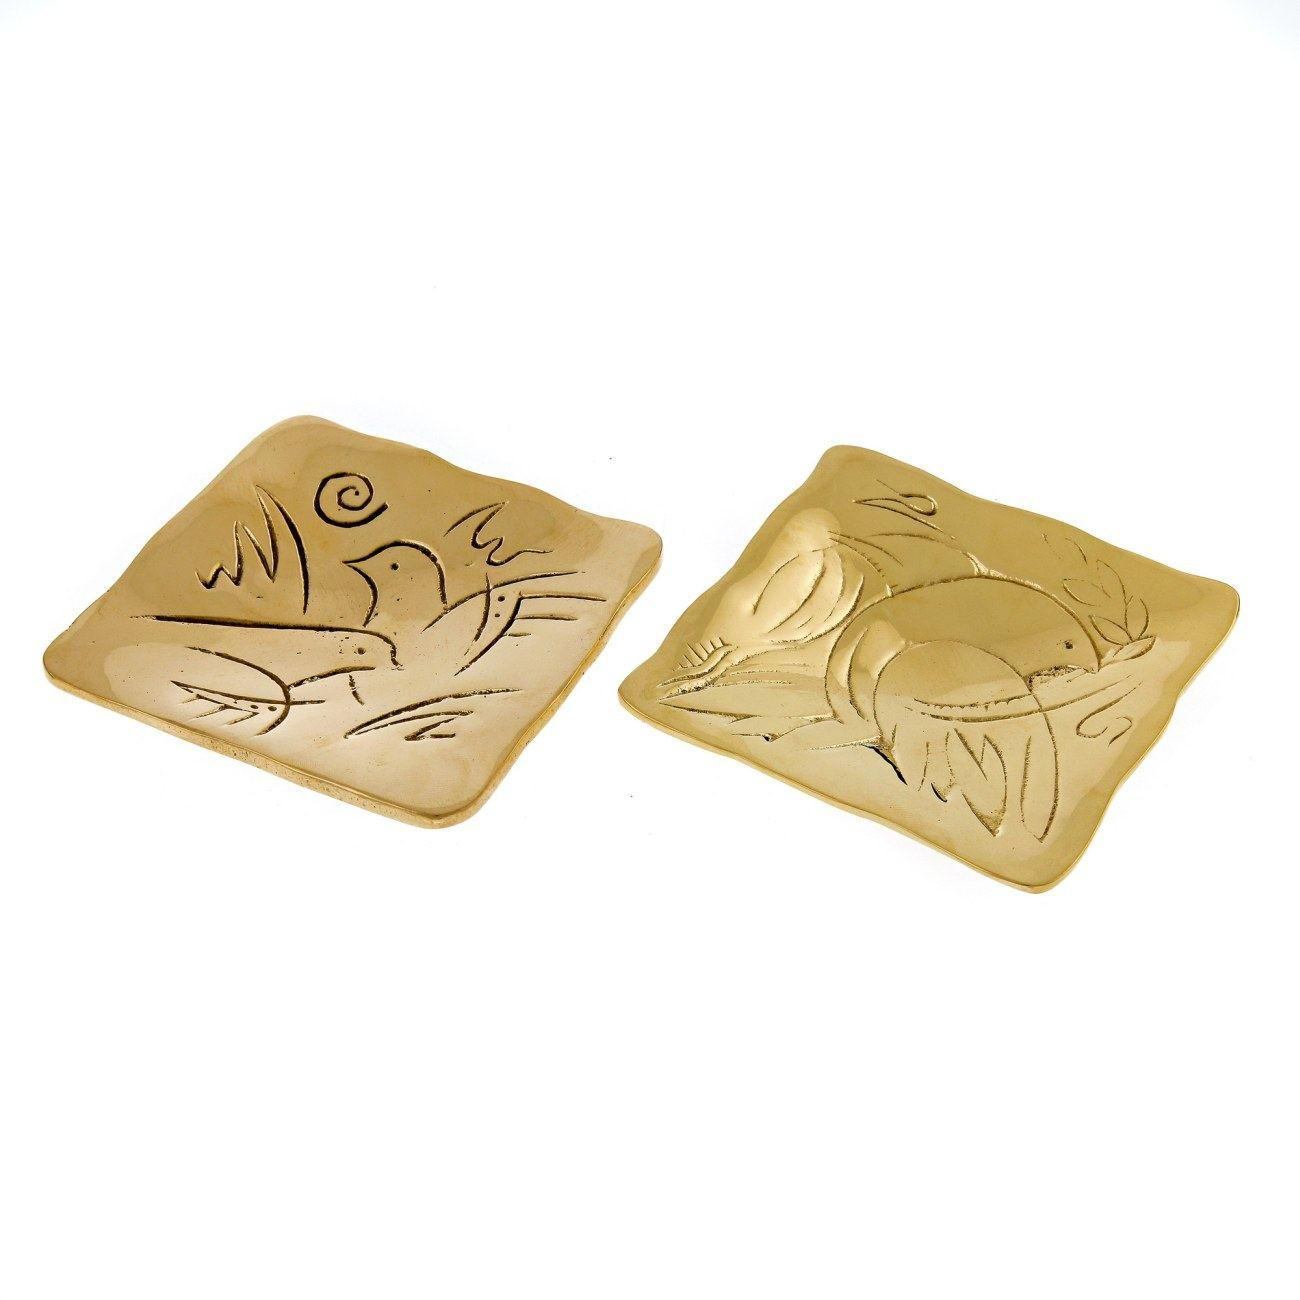 Decorative Metal Plate, Engraved 2 Dove Birds Design - Handmade ...